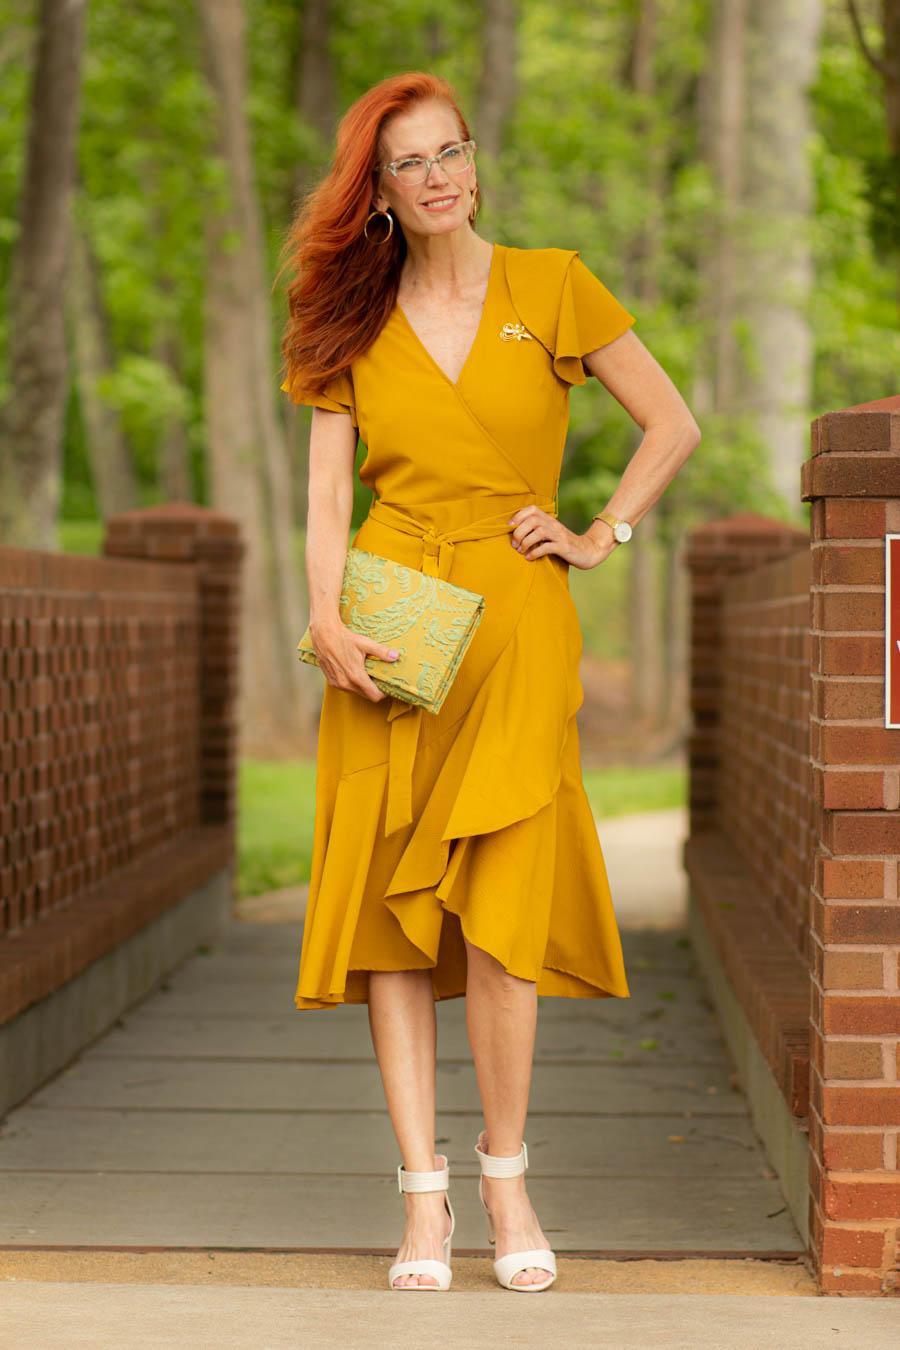 Coastal Clutch NY with mustard dress